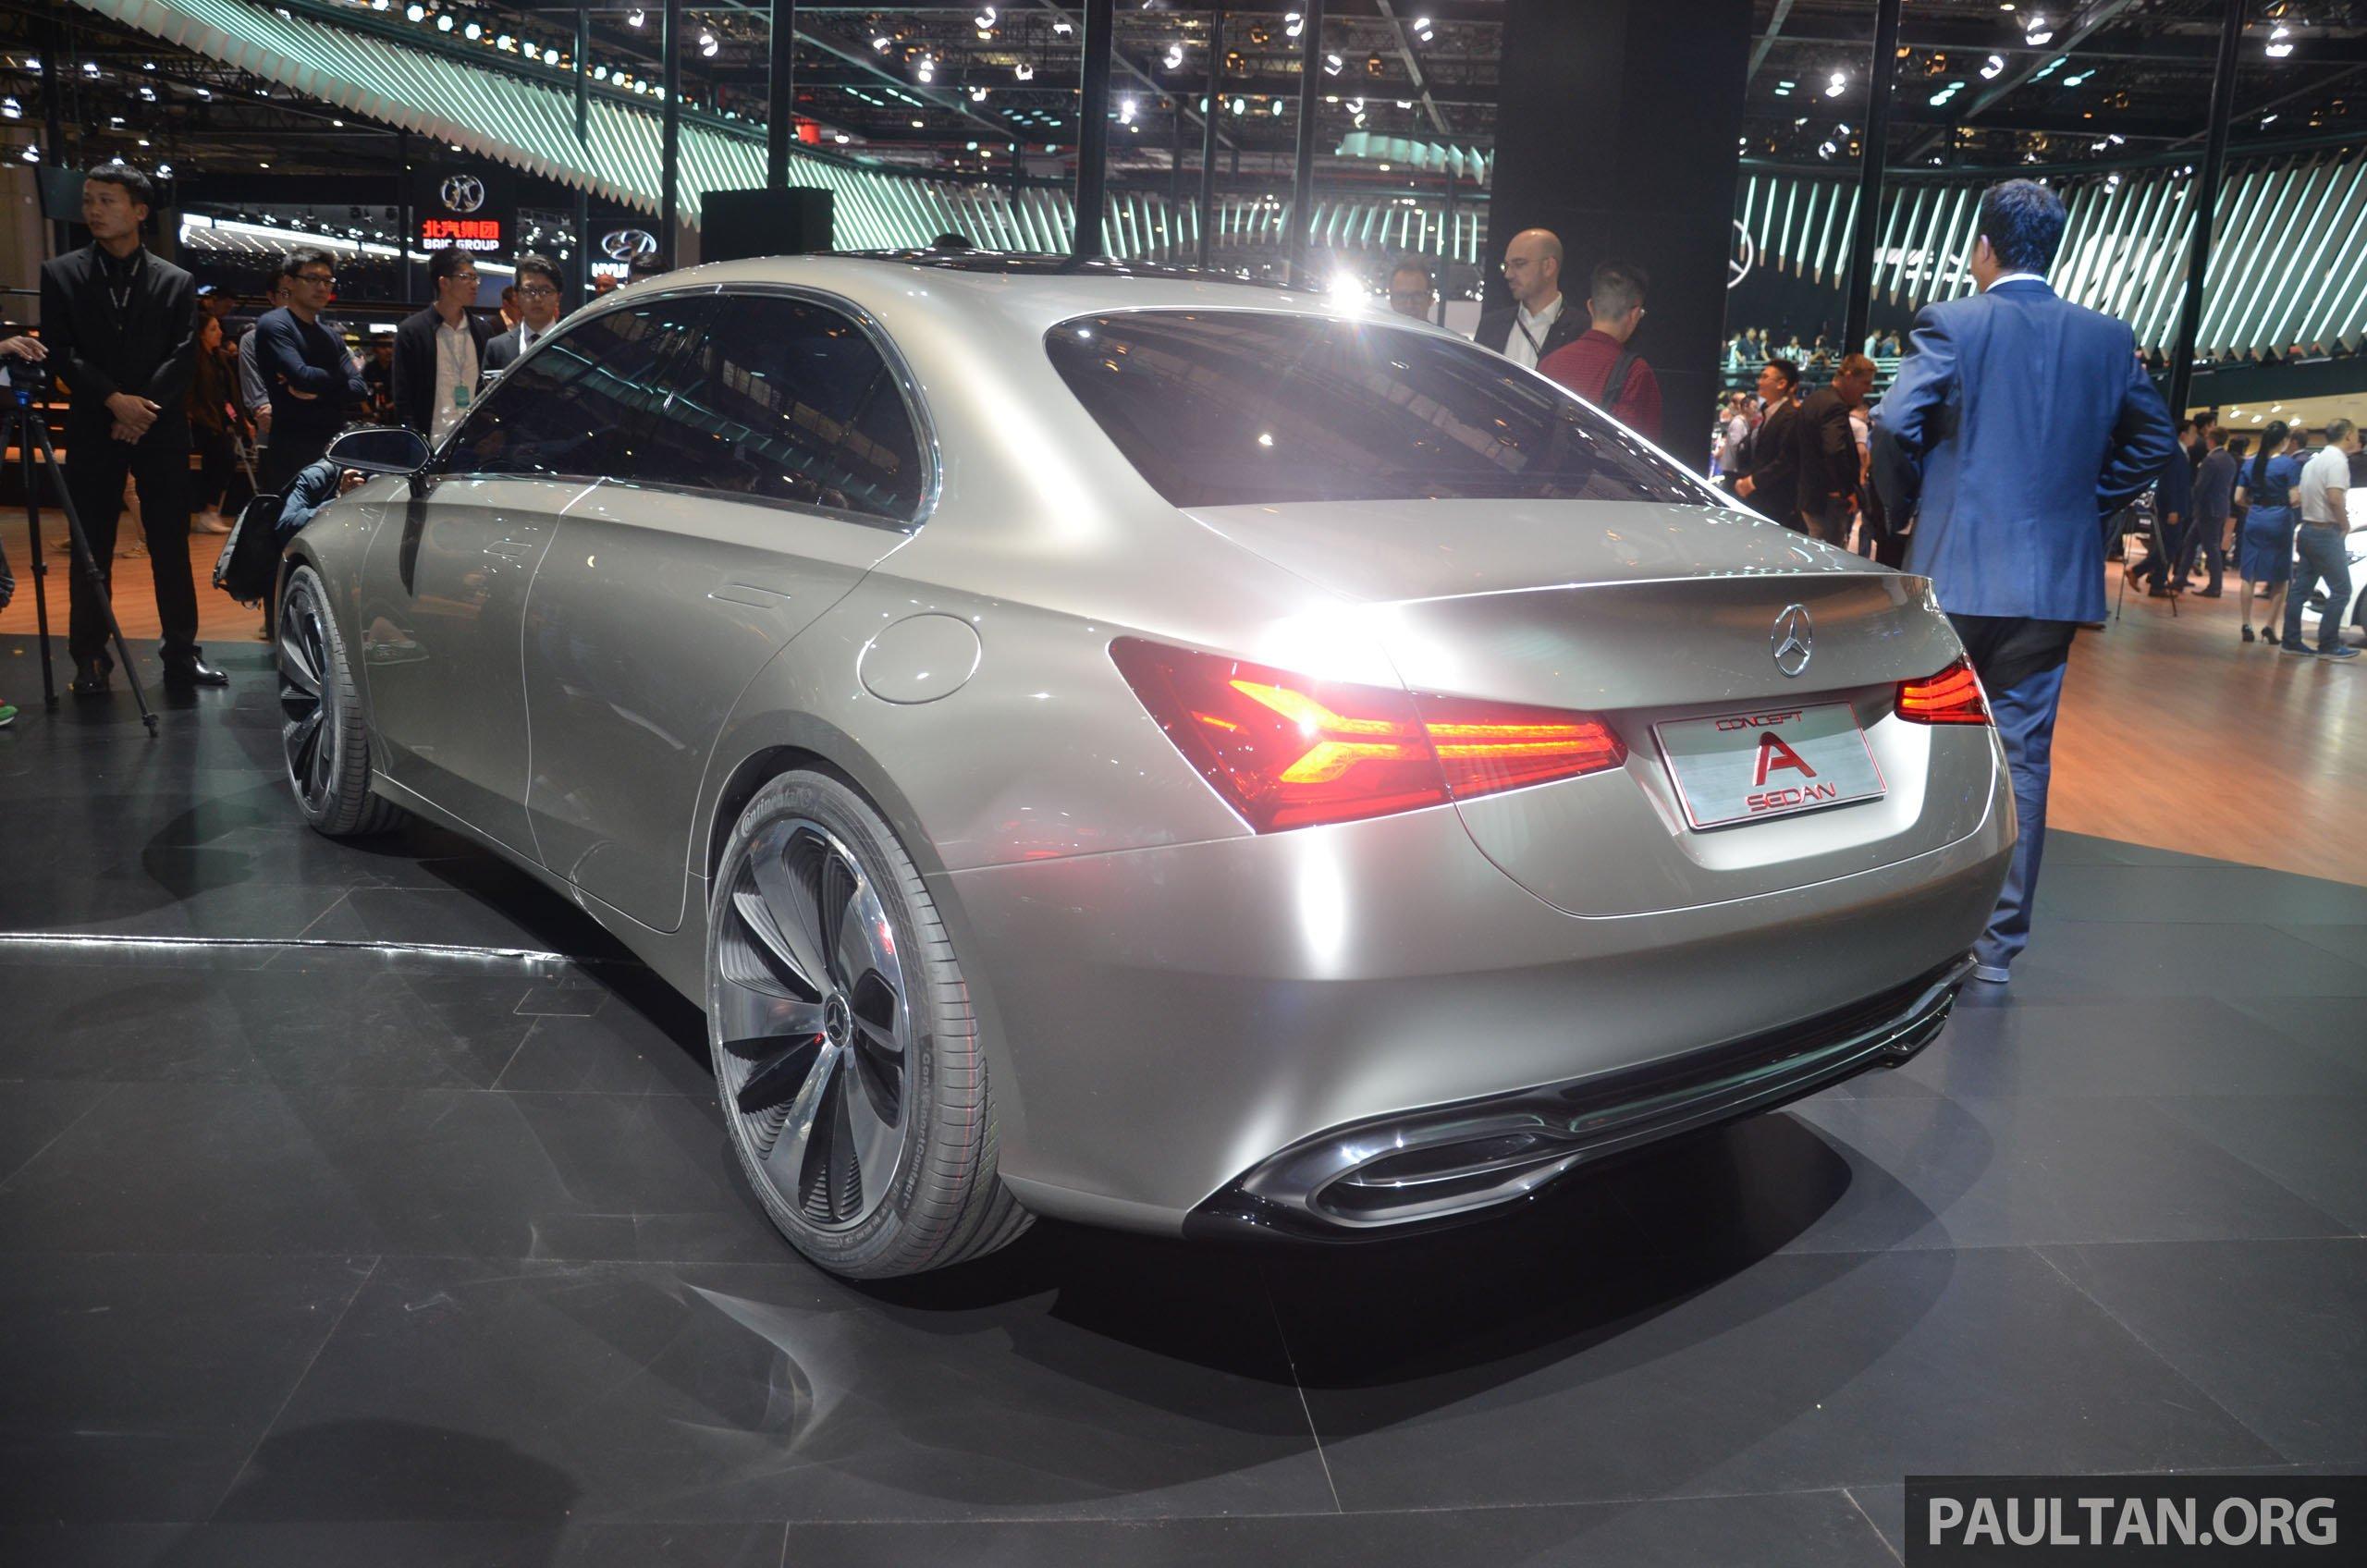 https://s2.paultan.org/image/2017/04/Mercedes-Benz-Concept-A-Sedan-Shanghai-live-14.jpg